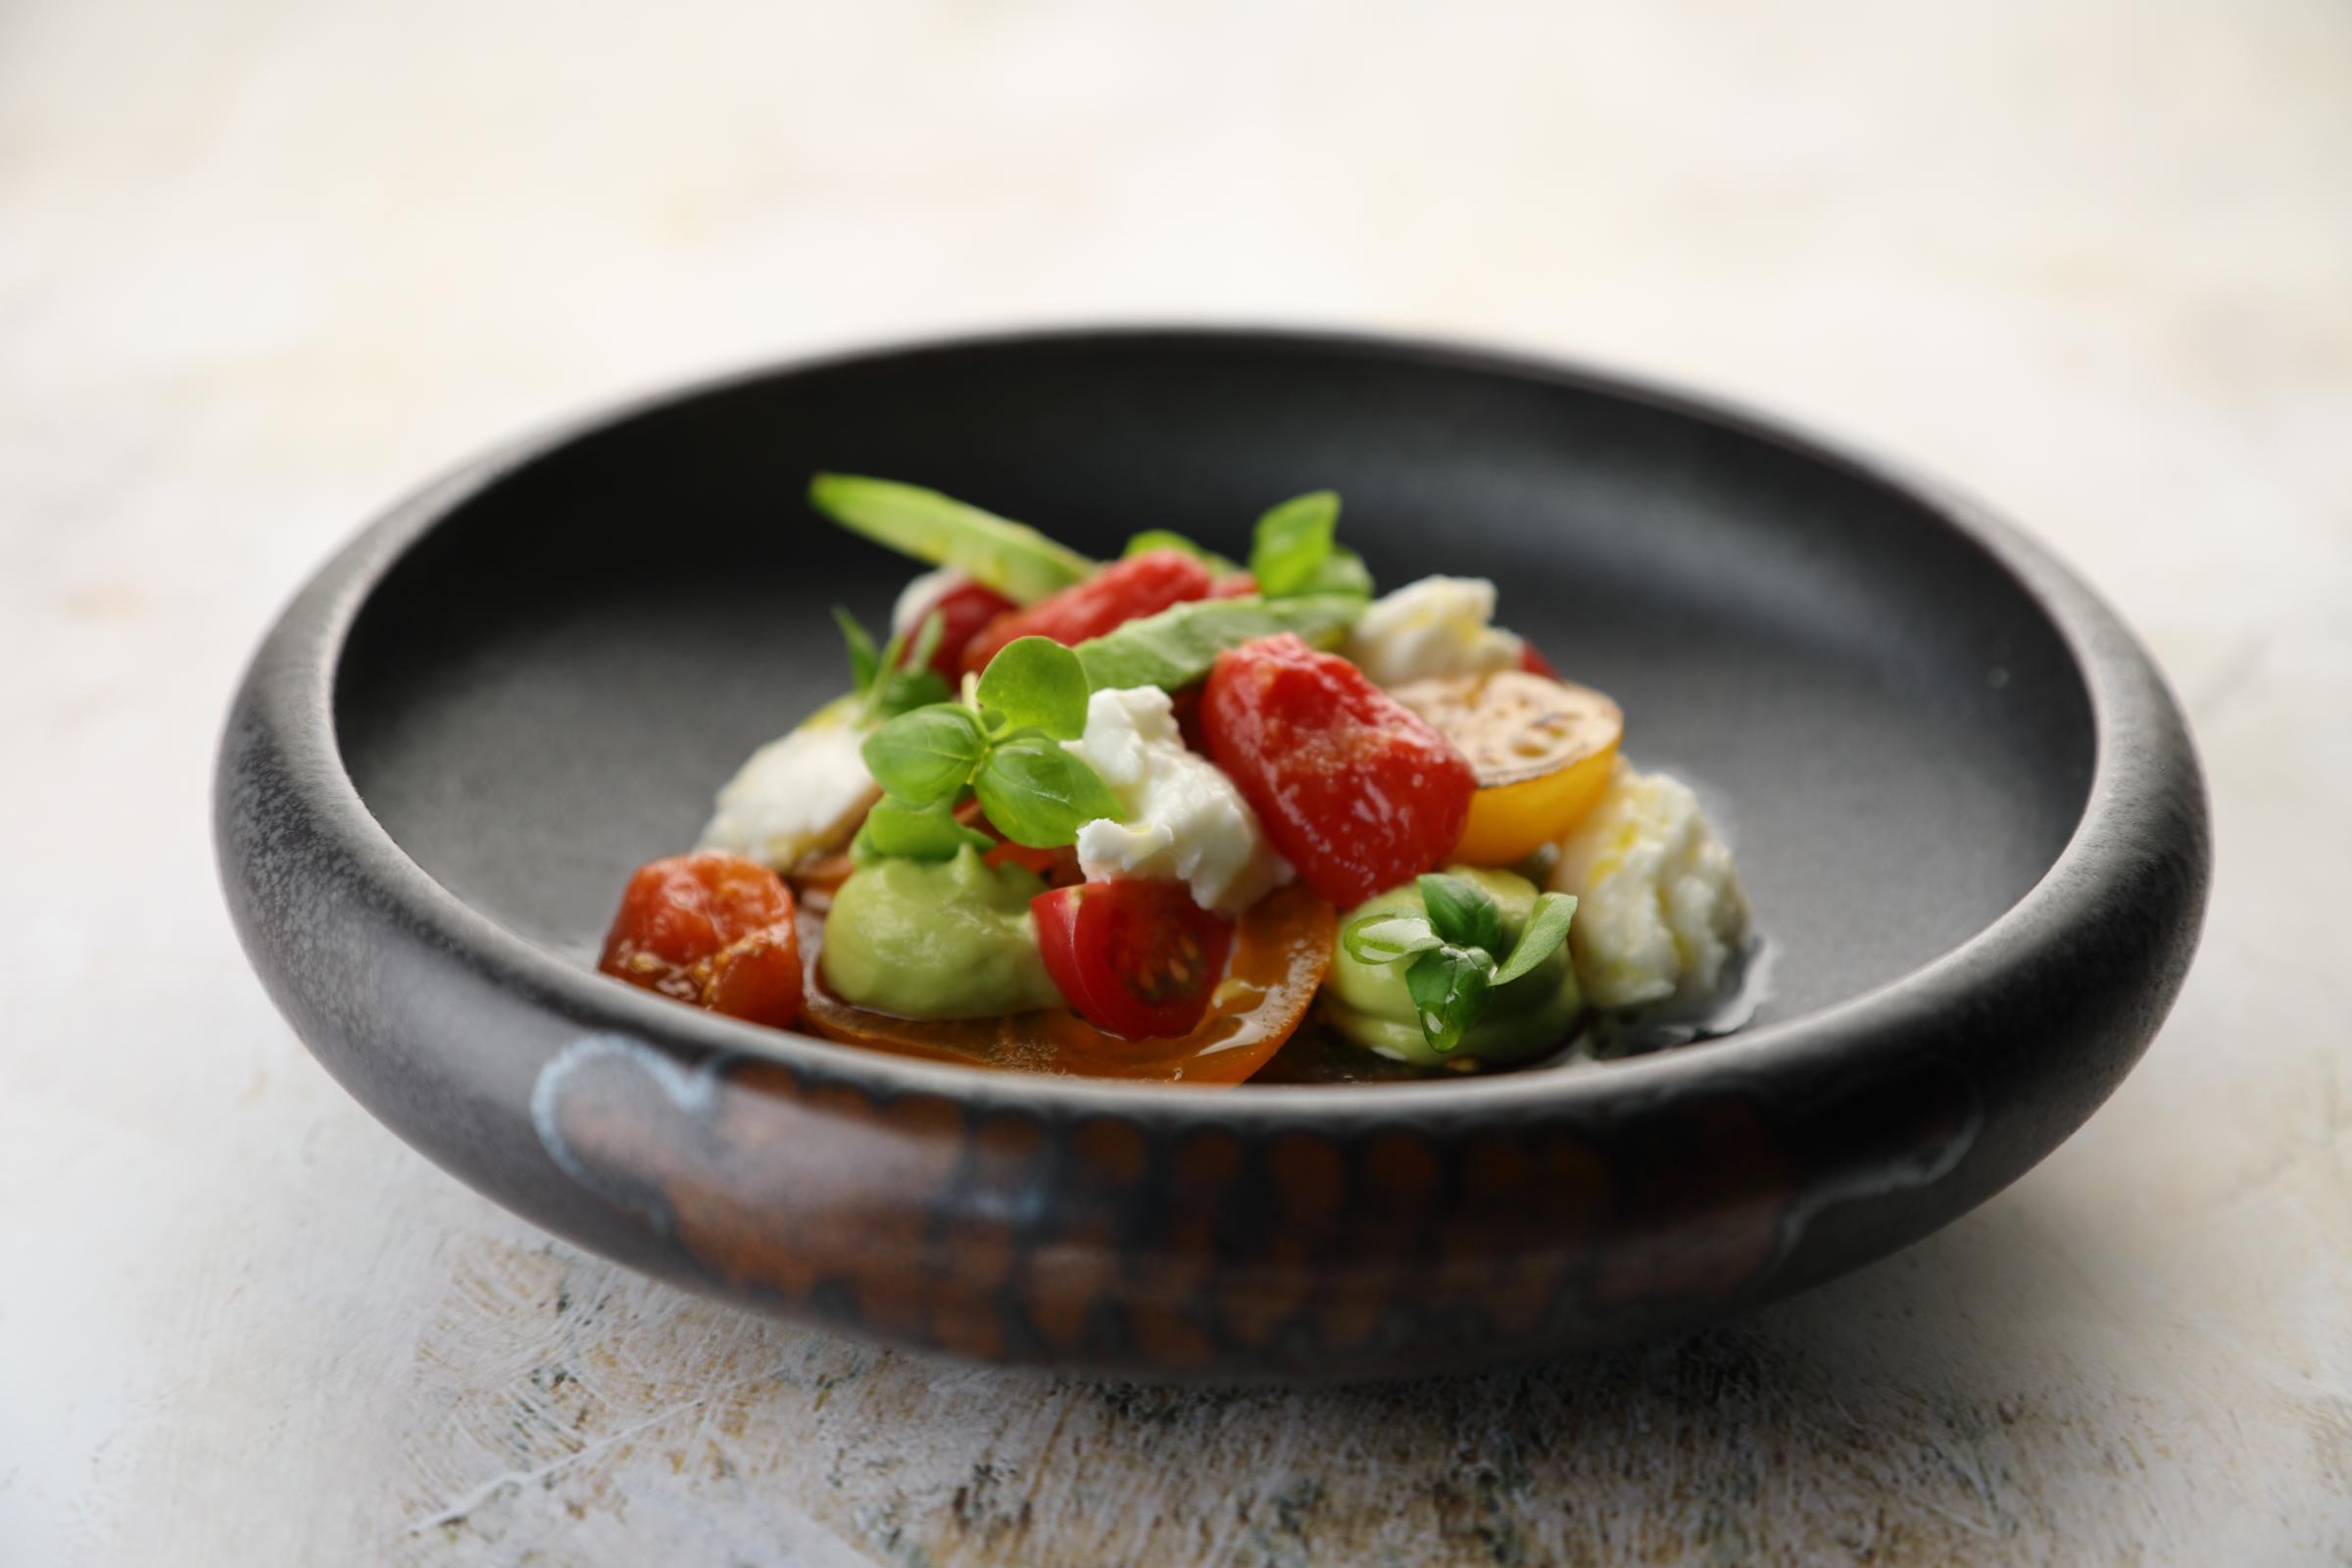 Avocado mousse, tomatoes, basil & mozzarella. Recipe by Gary Townsend